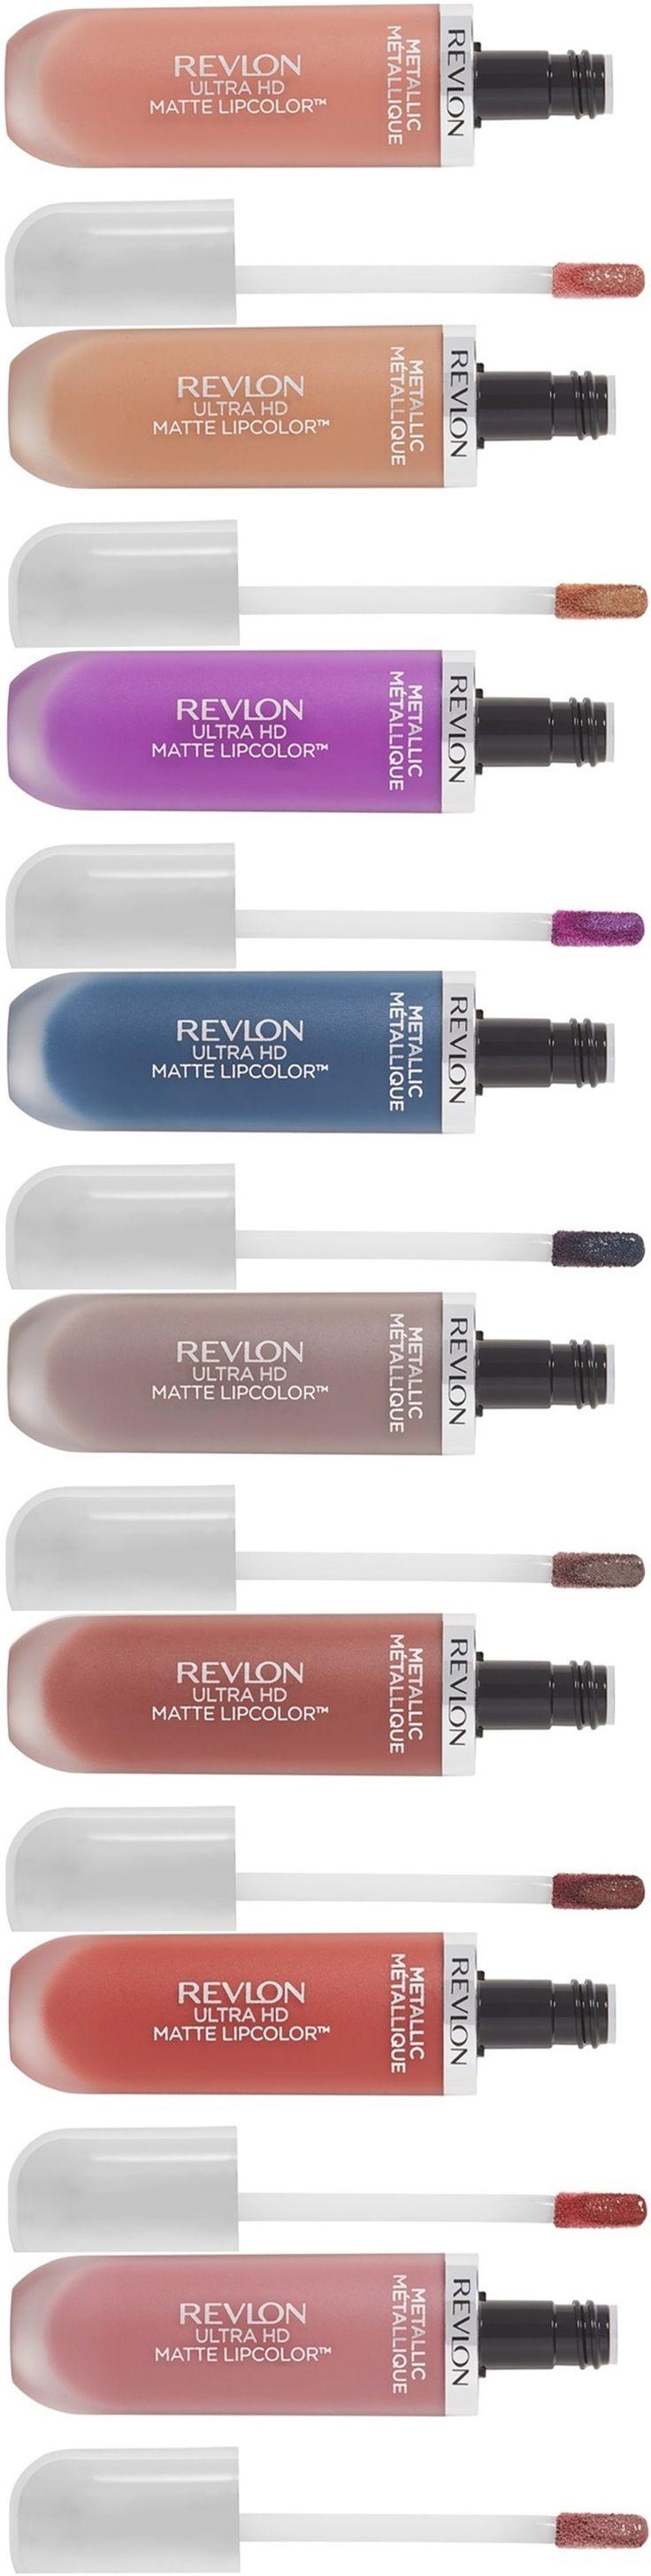 Revlon Ultra HD Matte Metallic Lipcolor for Summer 2017